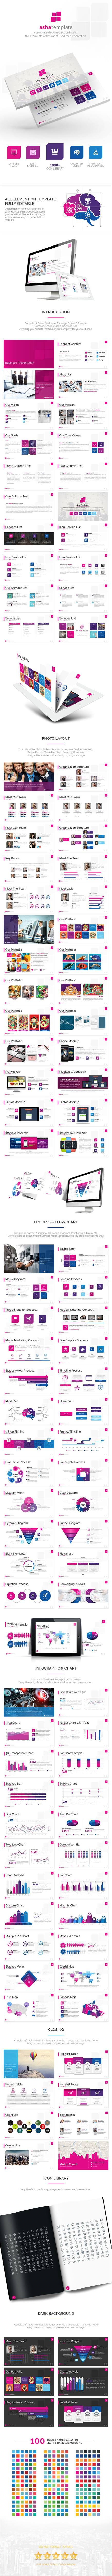 Asha - Business Powerpoint Template